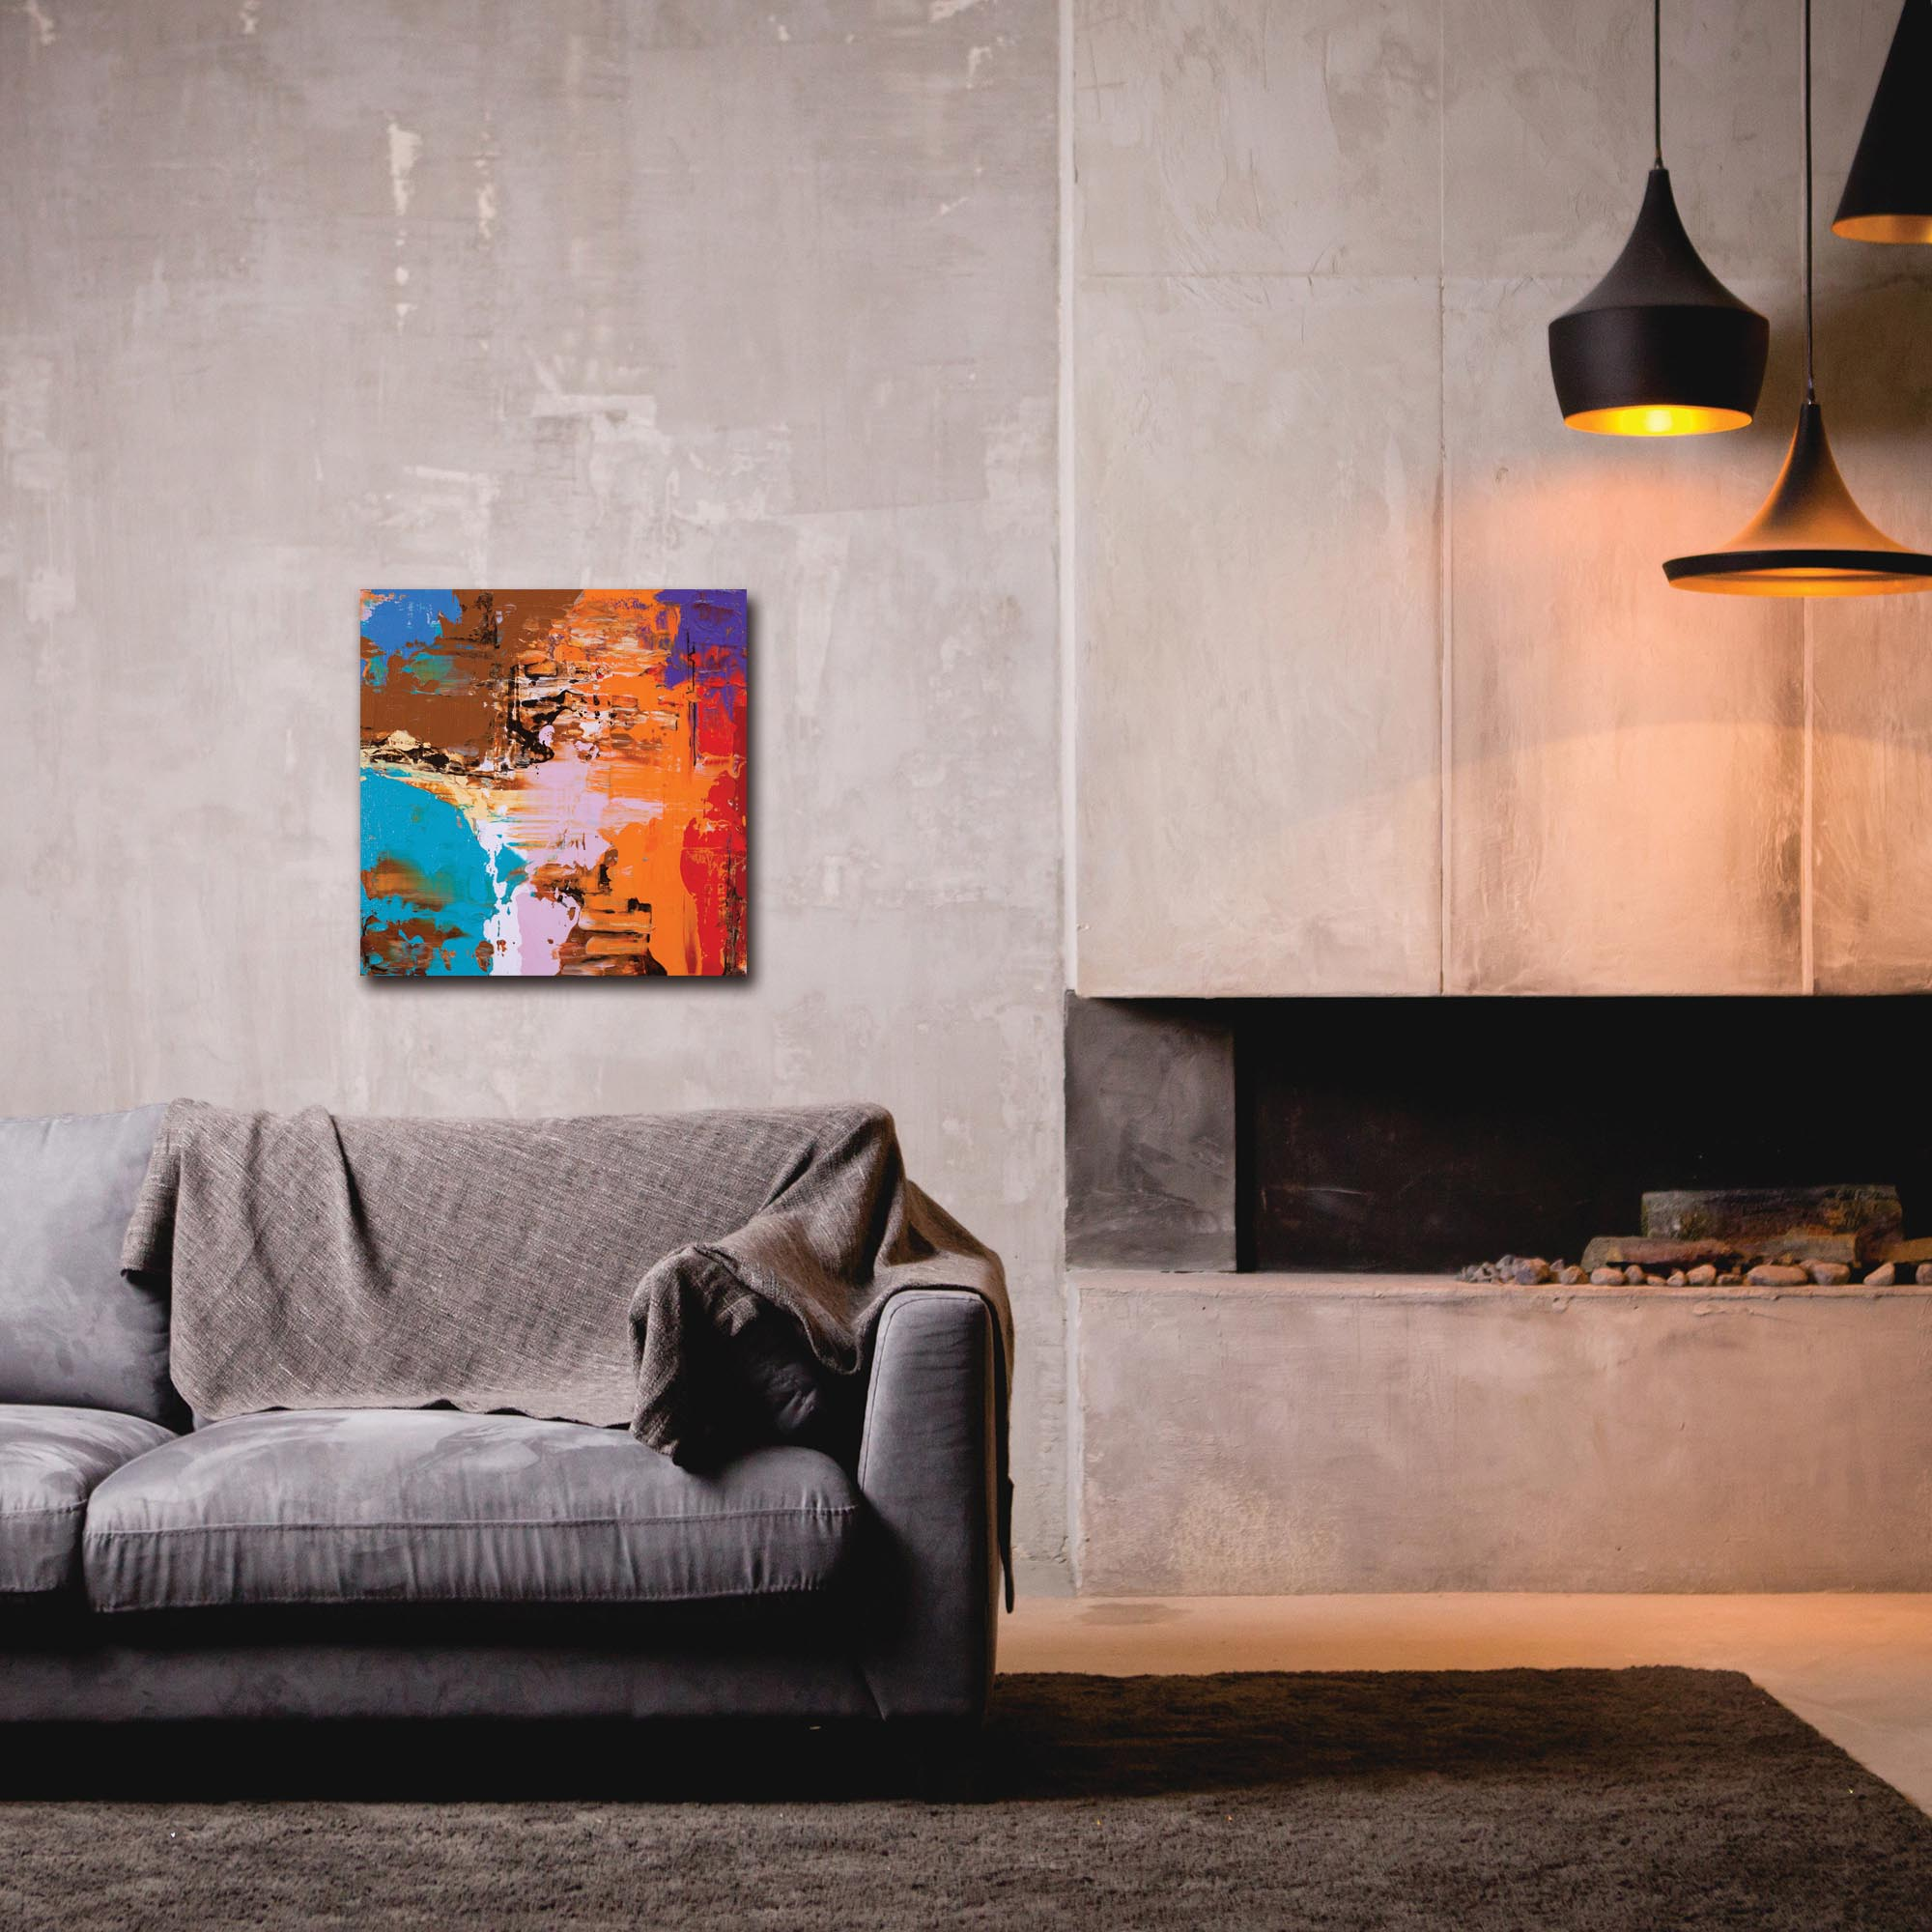 Abstract Wall Art 'Urban Life 14' - Urban Decor on Metal or Plexiglass - Lifestyle View